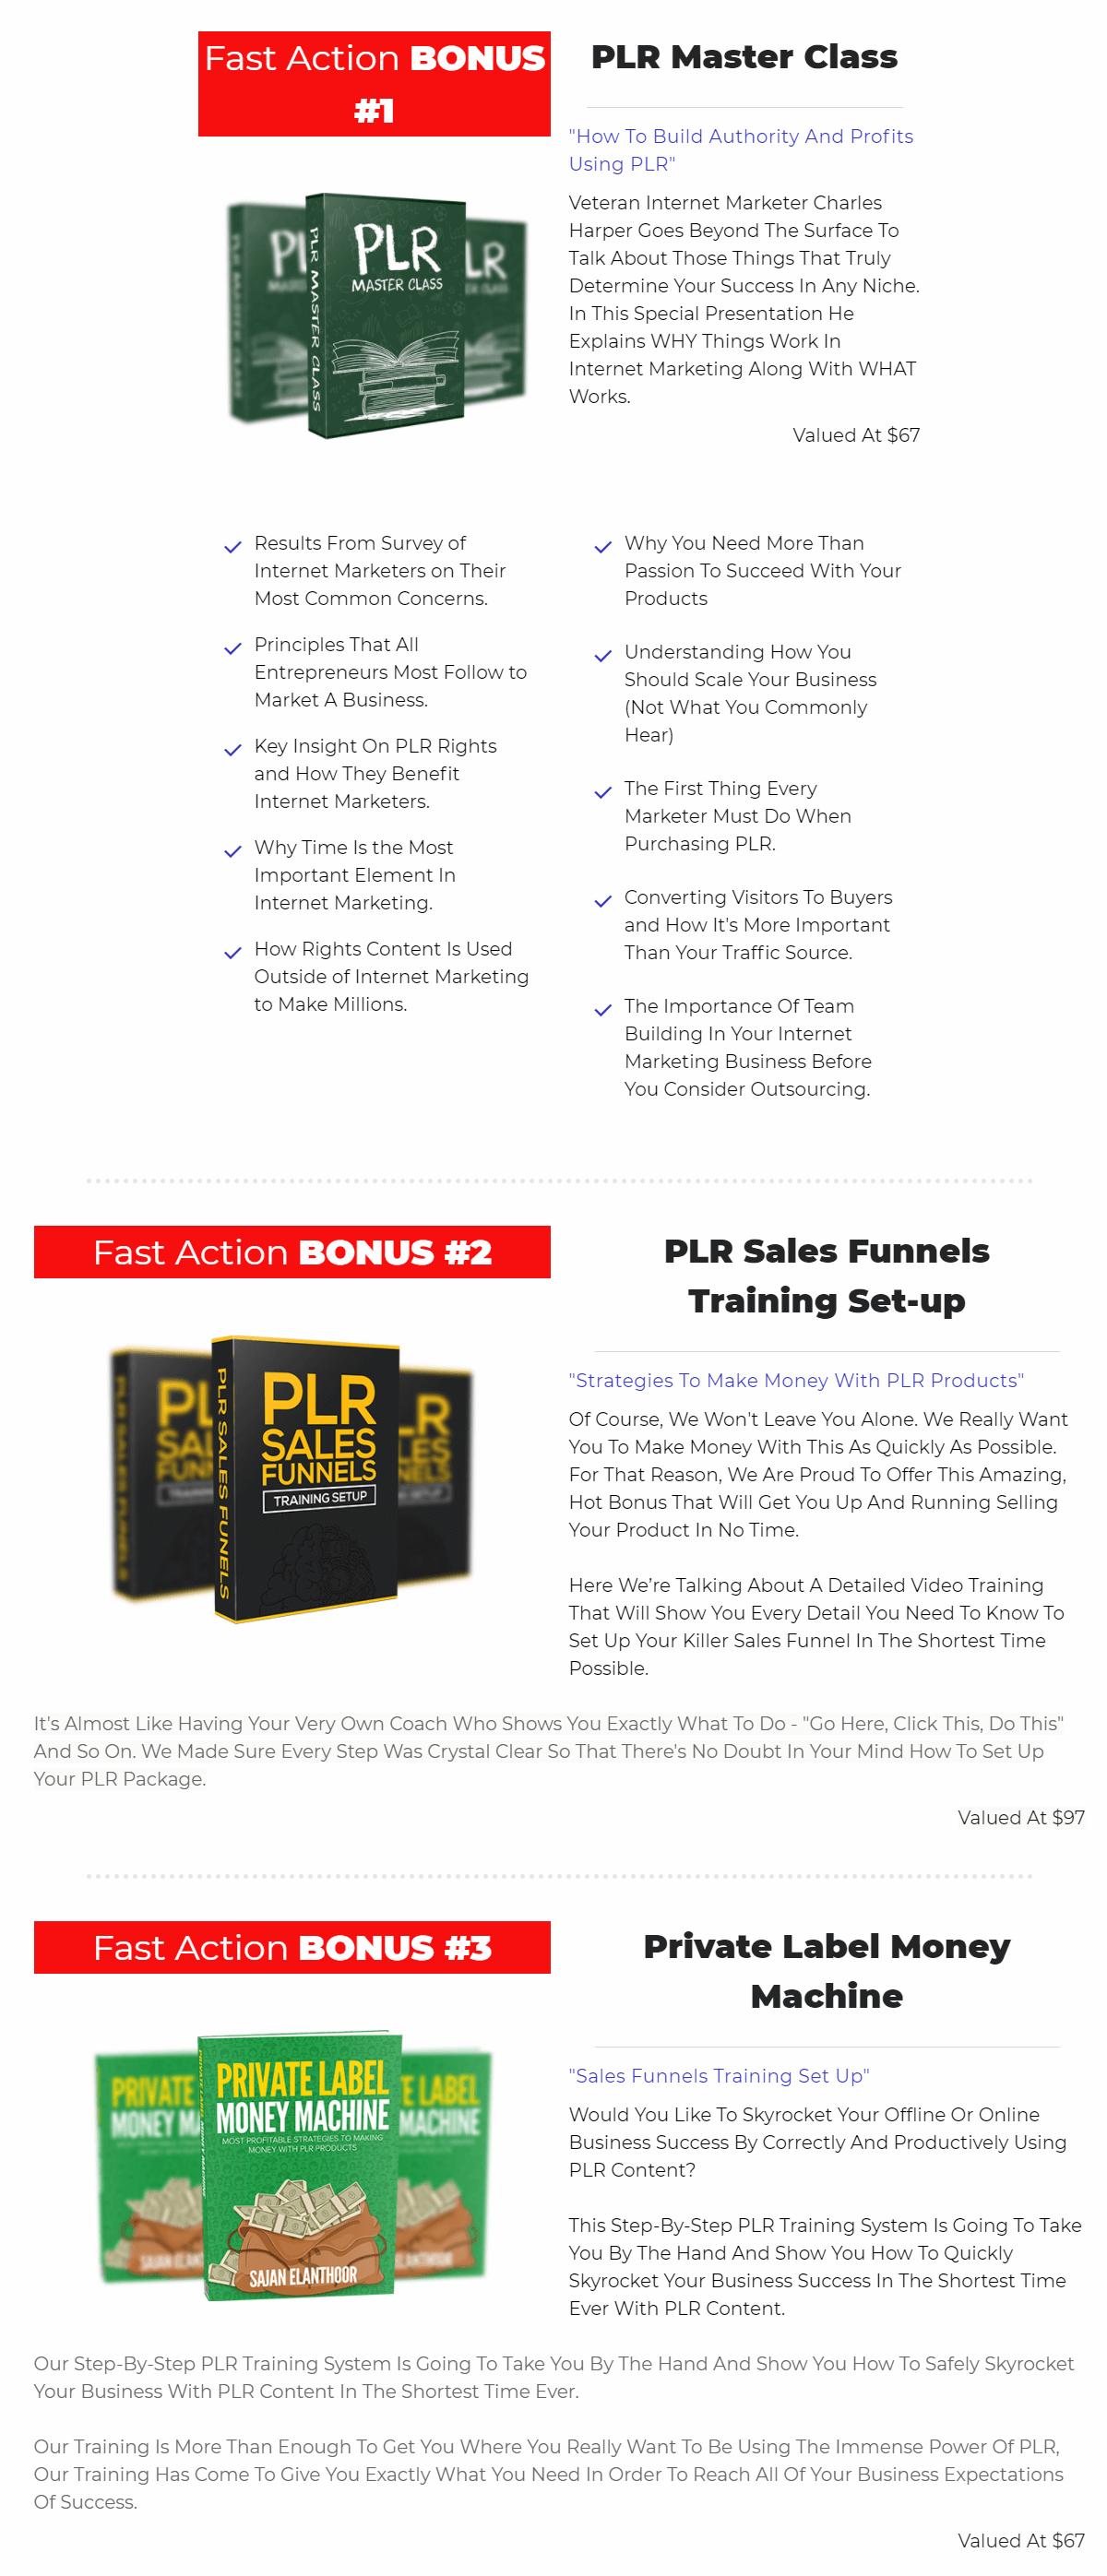 Facebook-Live-Mastery-PLR-bonus